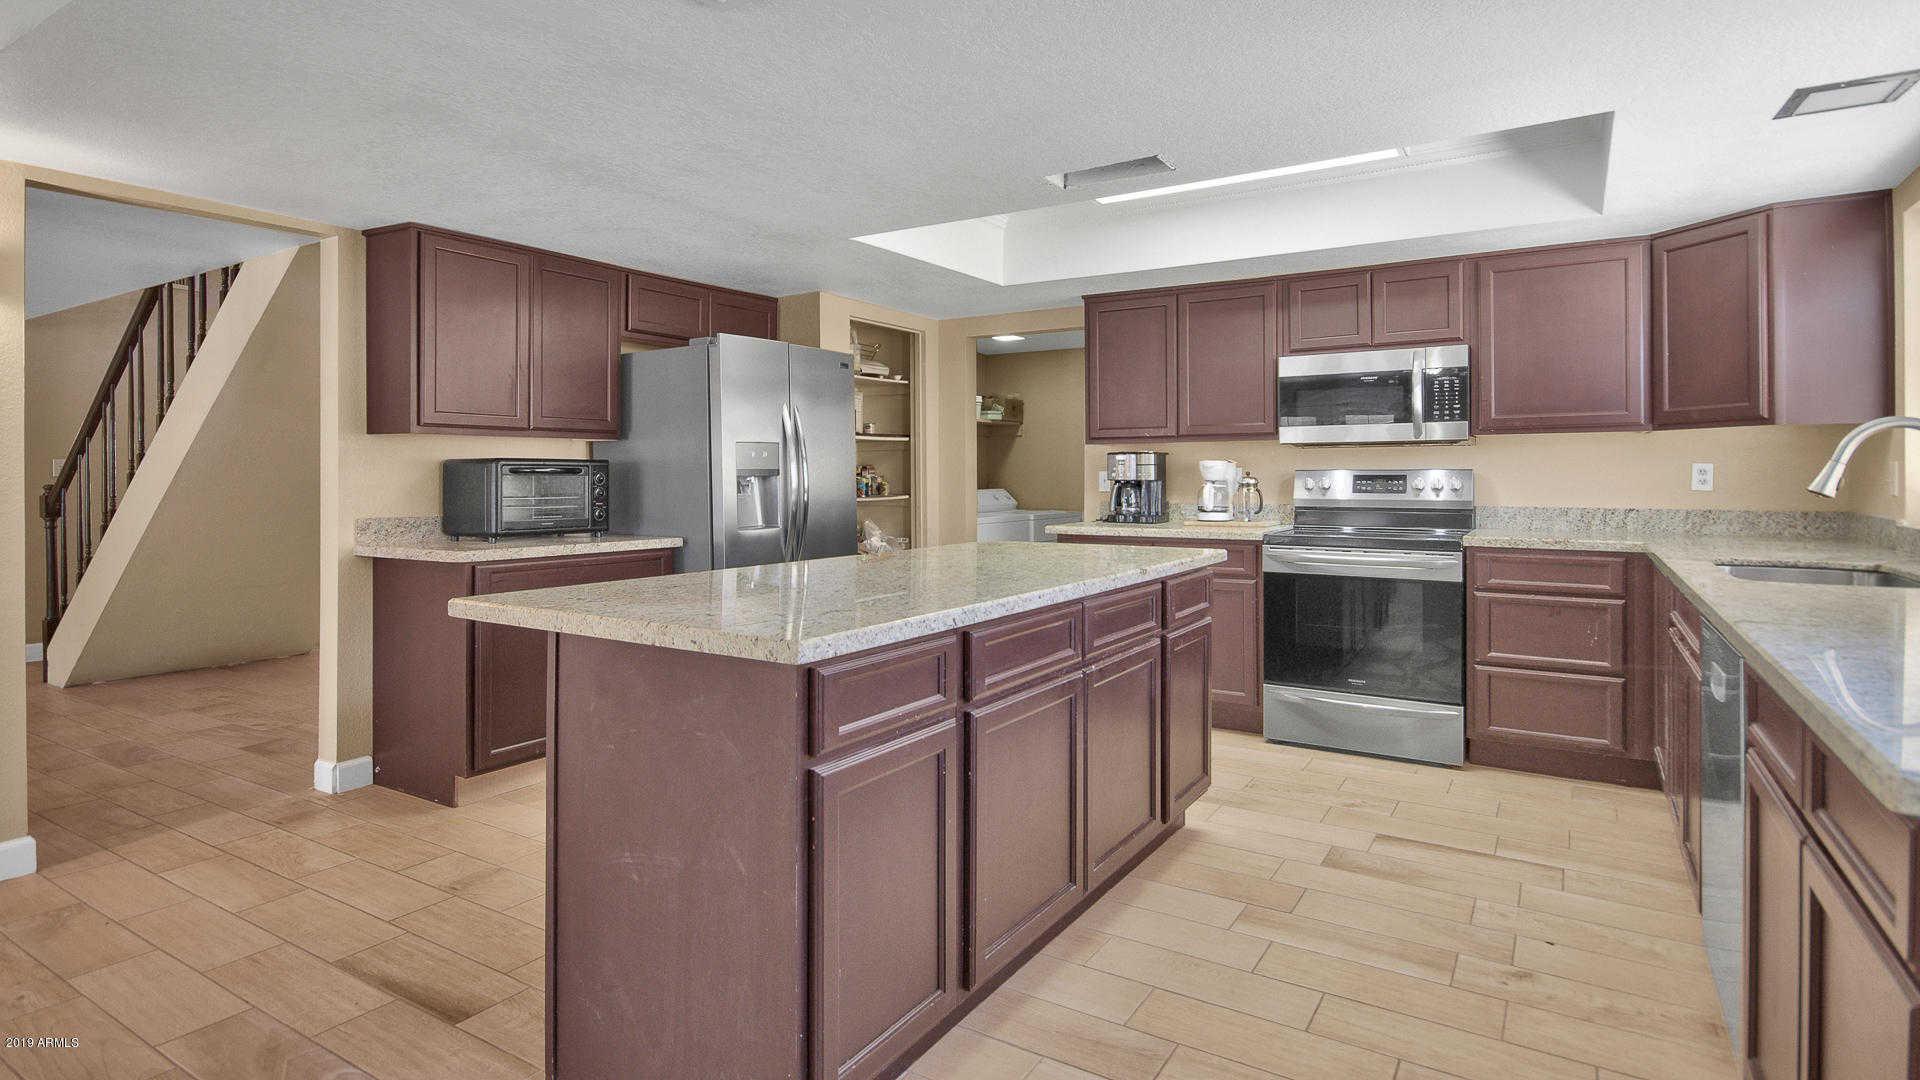 $310,000 - 6Br/4Ba - Home for Sale in Greenbrier Unit 5 Lot 291-371, Glendale